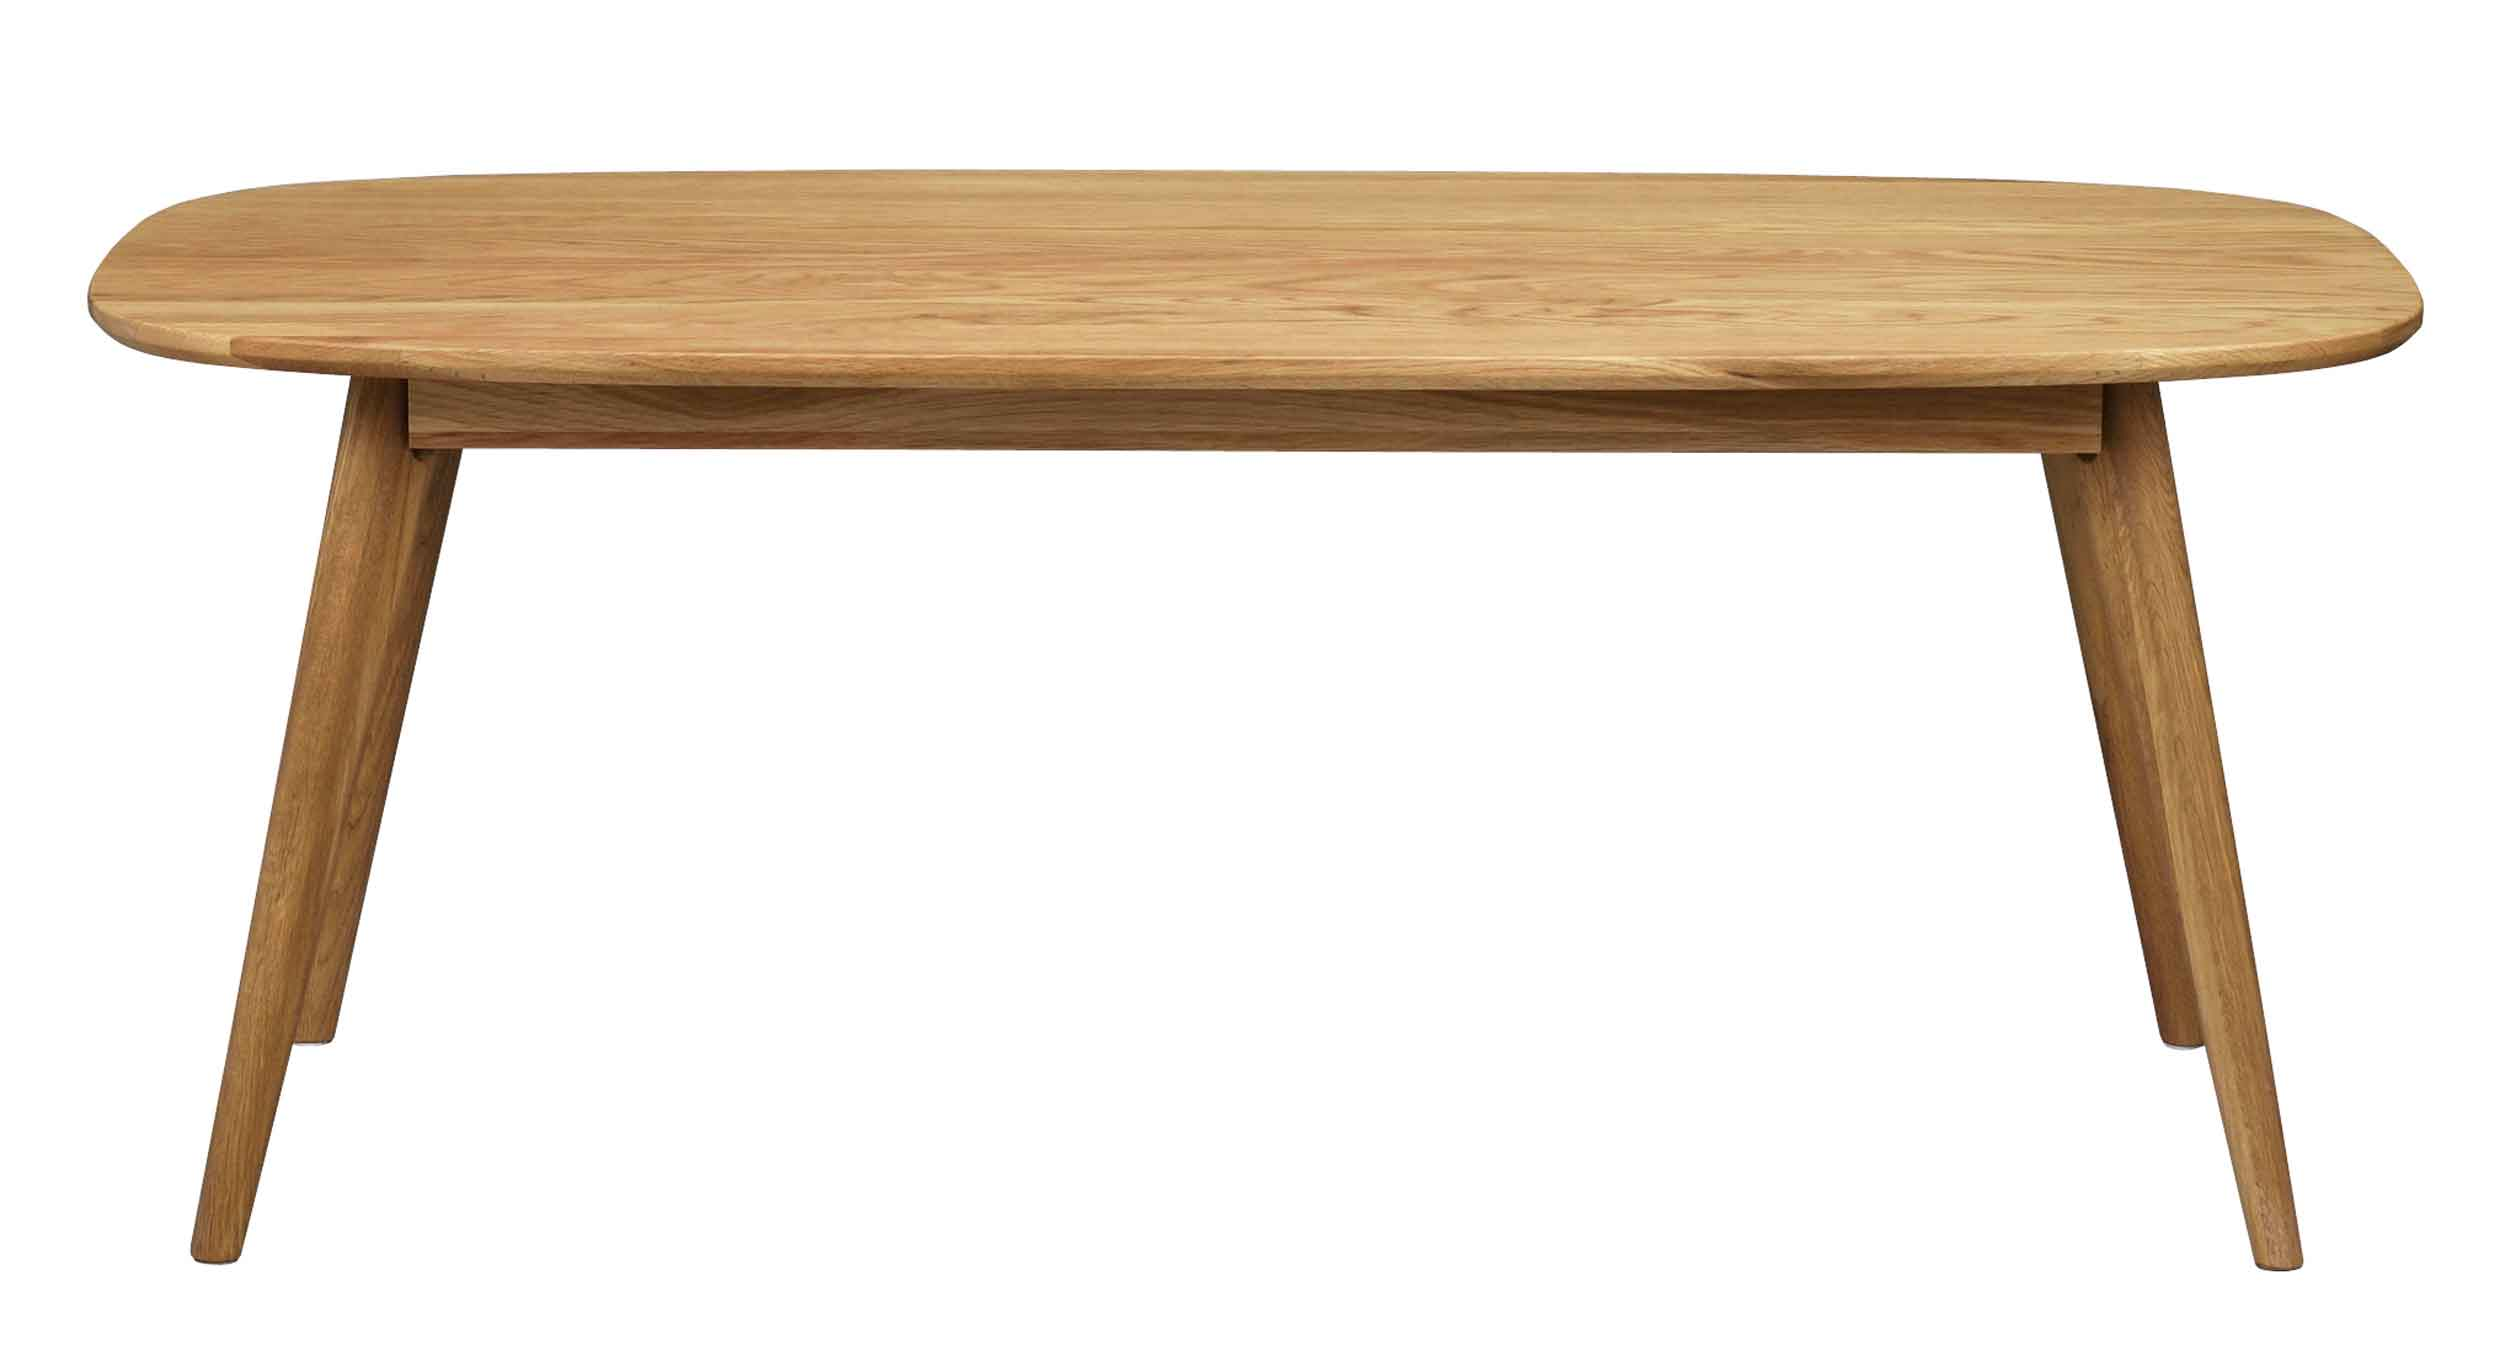 Yumi sofabord - Lakeret egetræ, 125x60